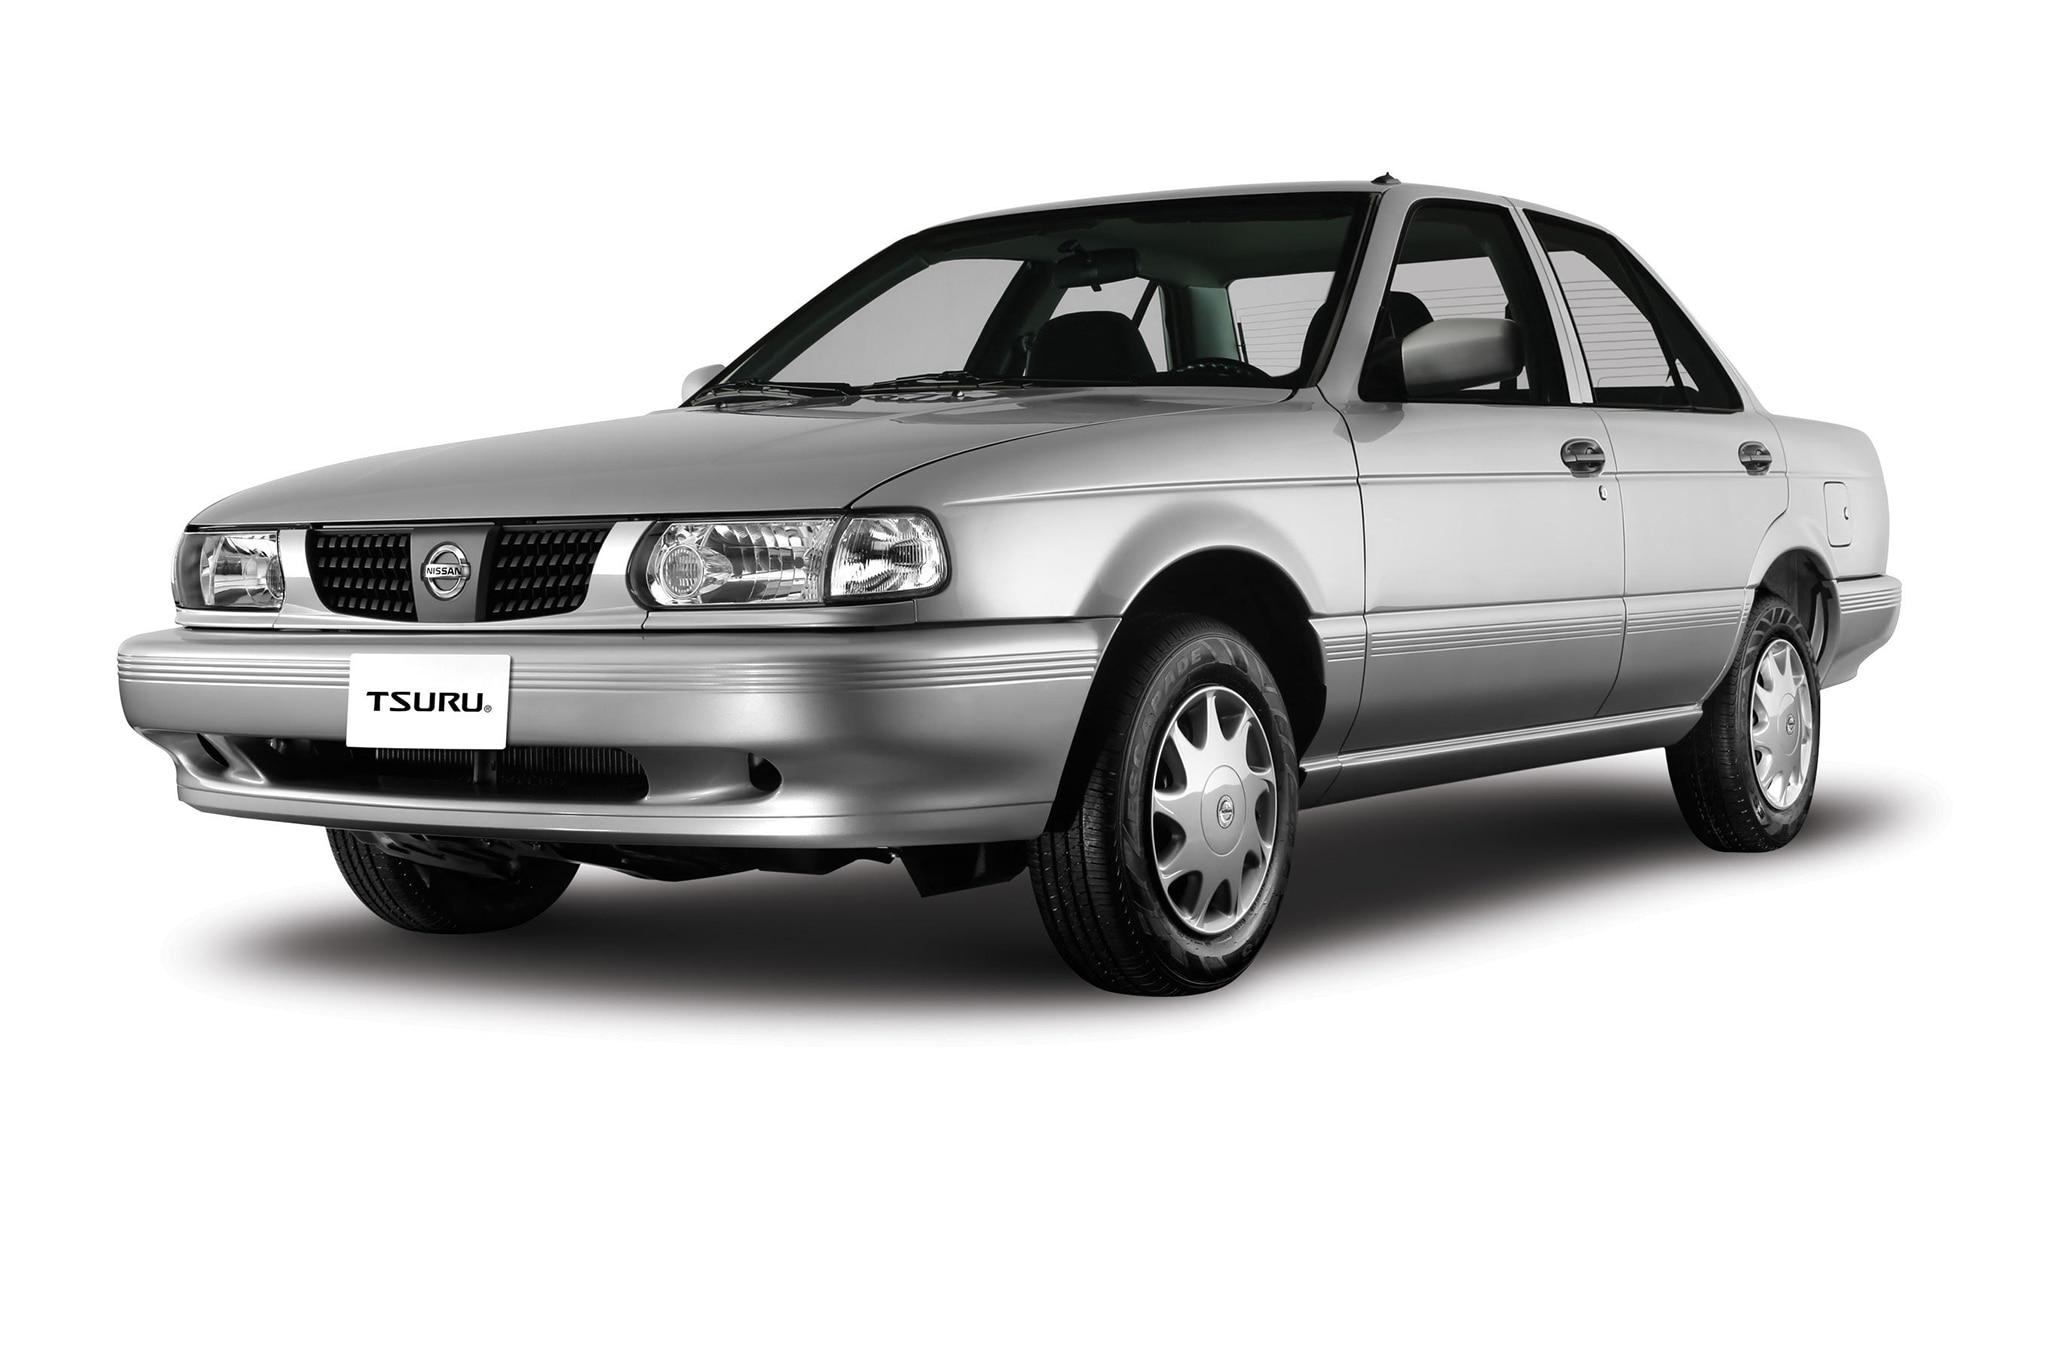 https://www.automobilemag.com/uploads/sites/11/2016/10/Nissan-Tsuru-front-three-quarters.jpg